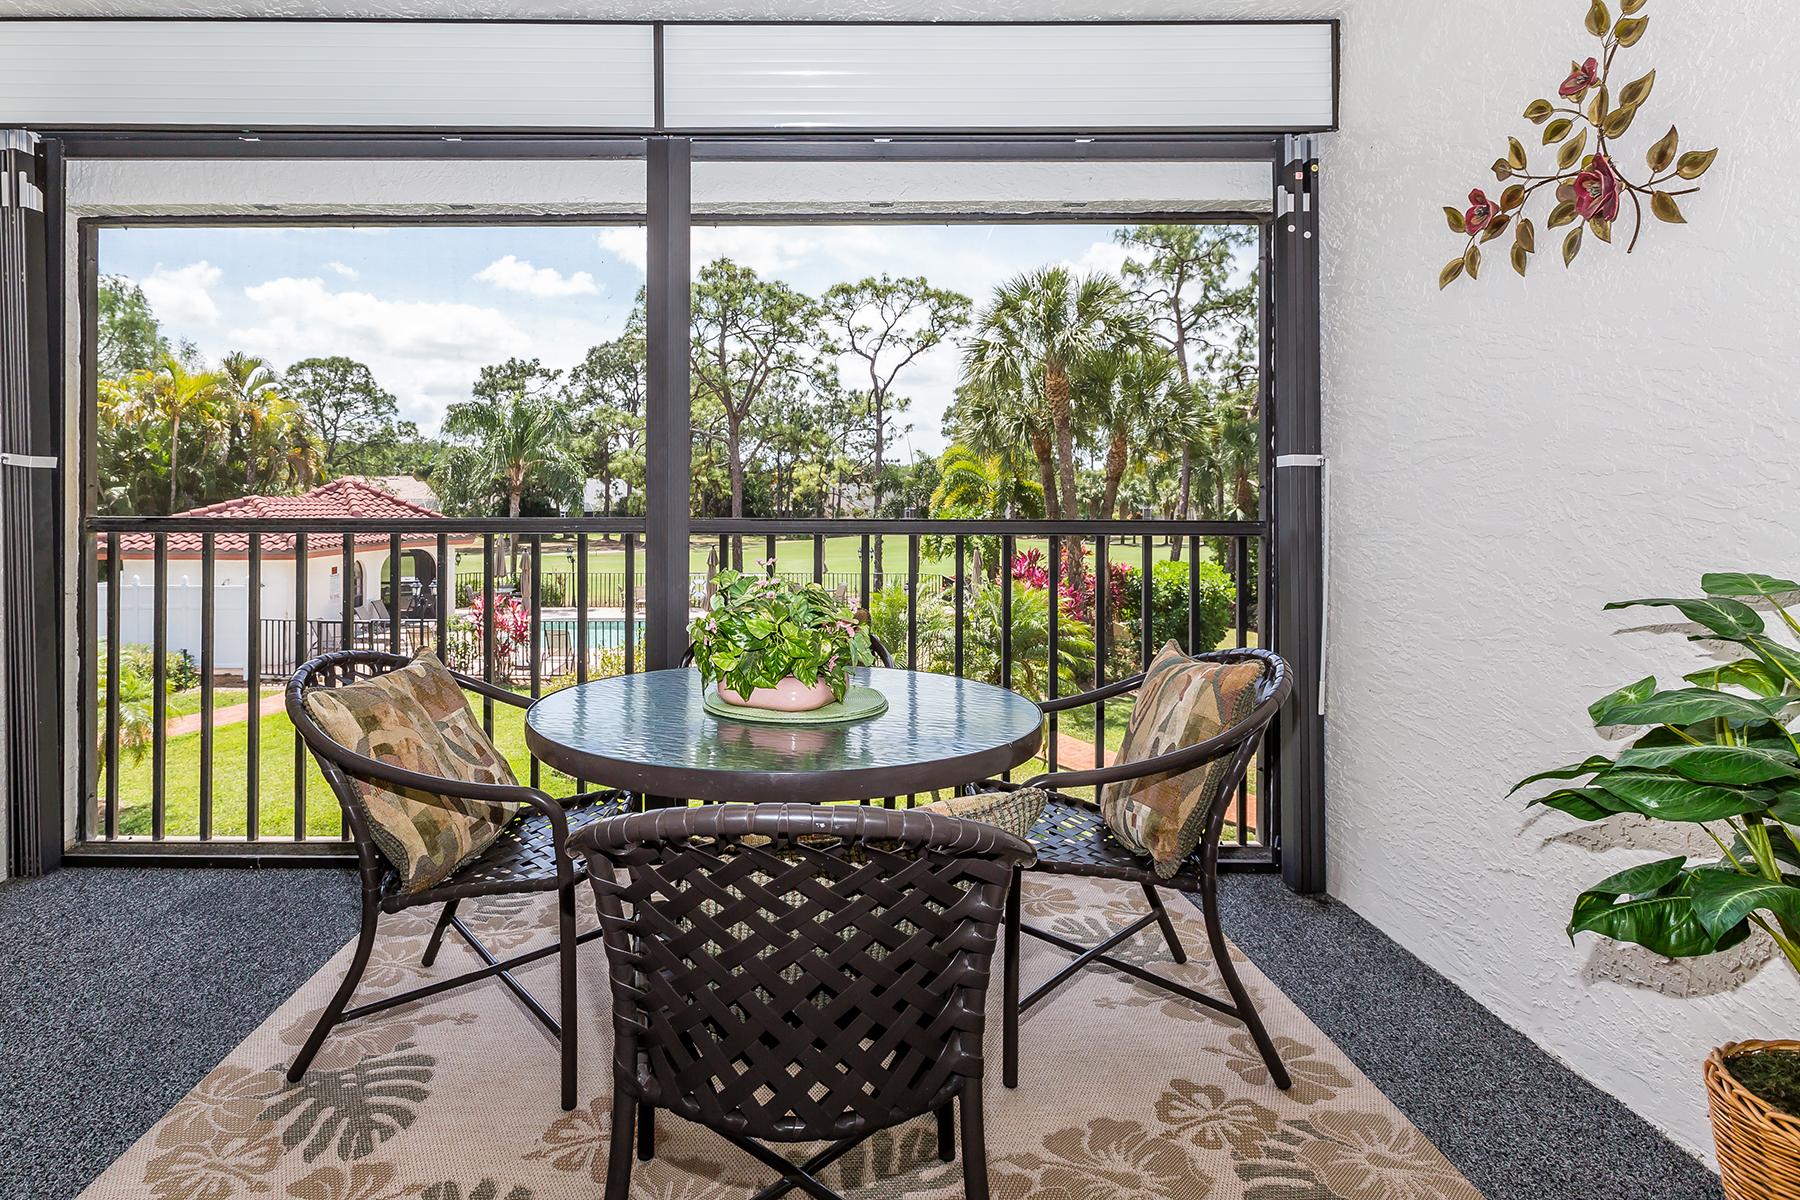 Condomínio para Venda às GLEN EAGLE 212 Deerwood Cir 6-7 Naples, Florida, 34113 Estados Unidos